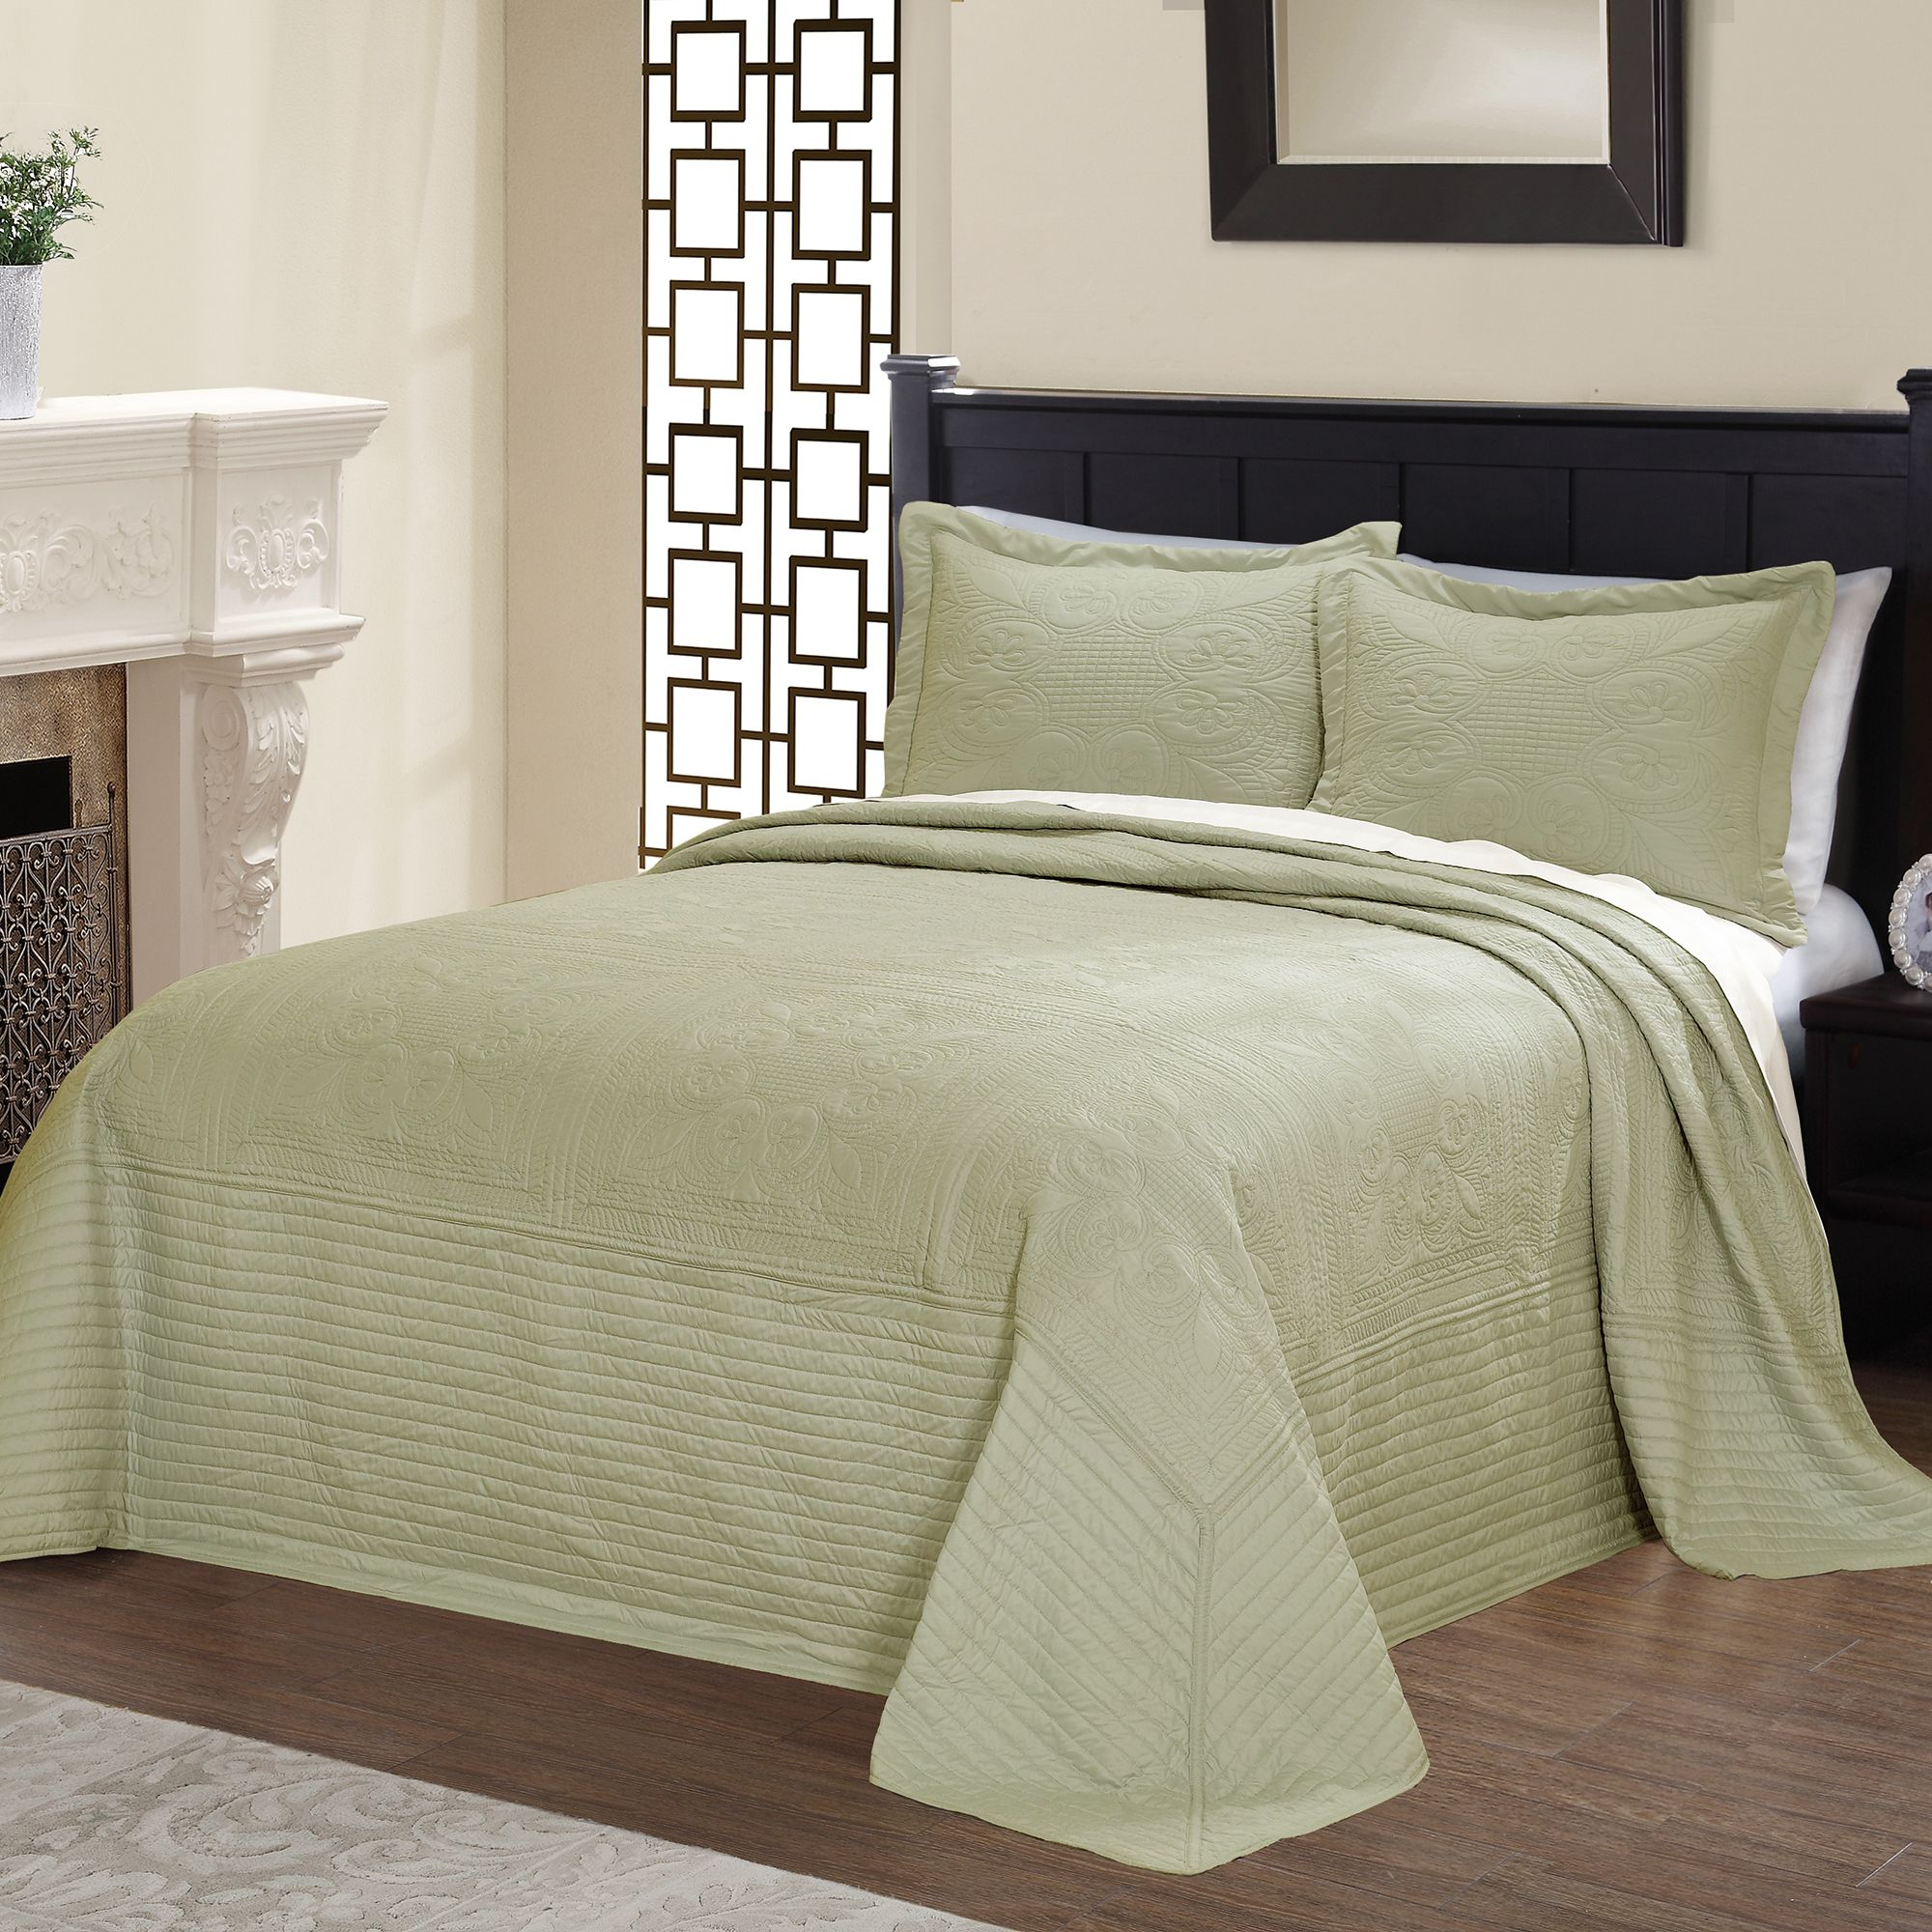 bed com product cotton set comforter overstock bedding bath madison sheet complete essentials aqua covina and park